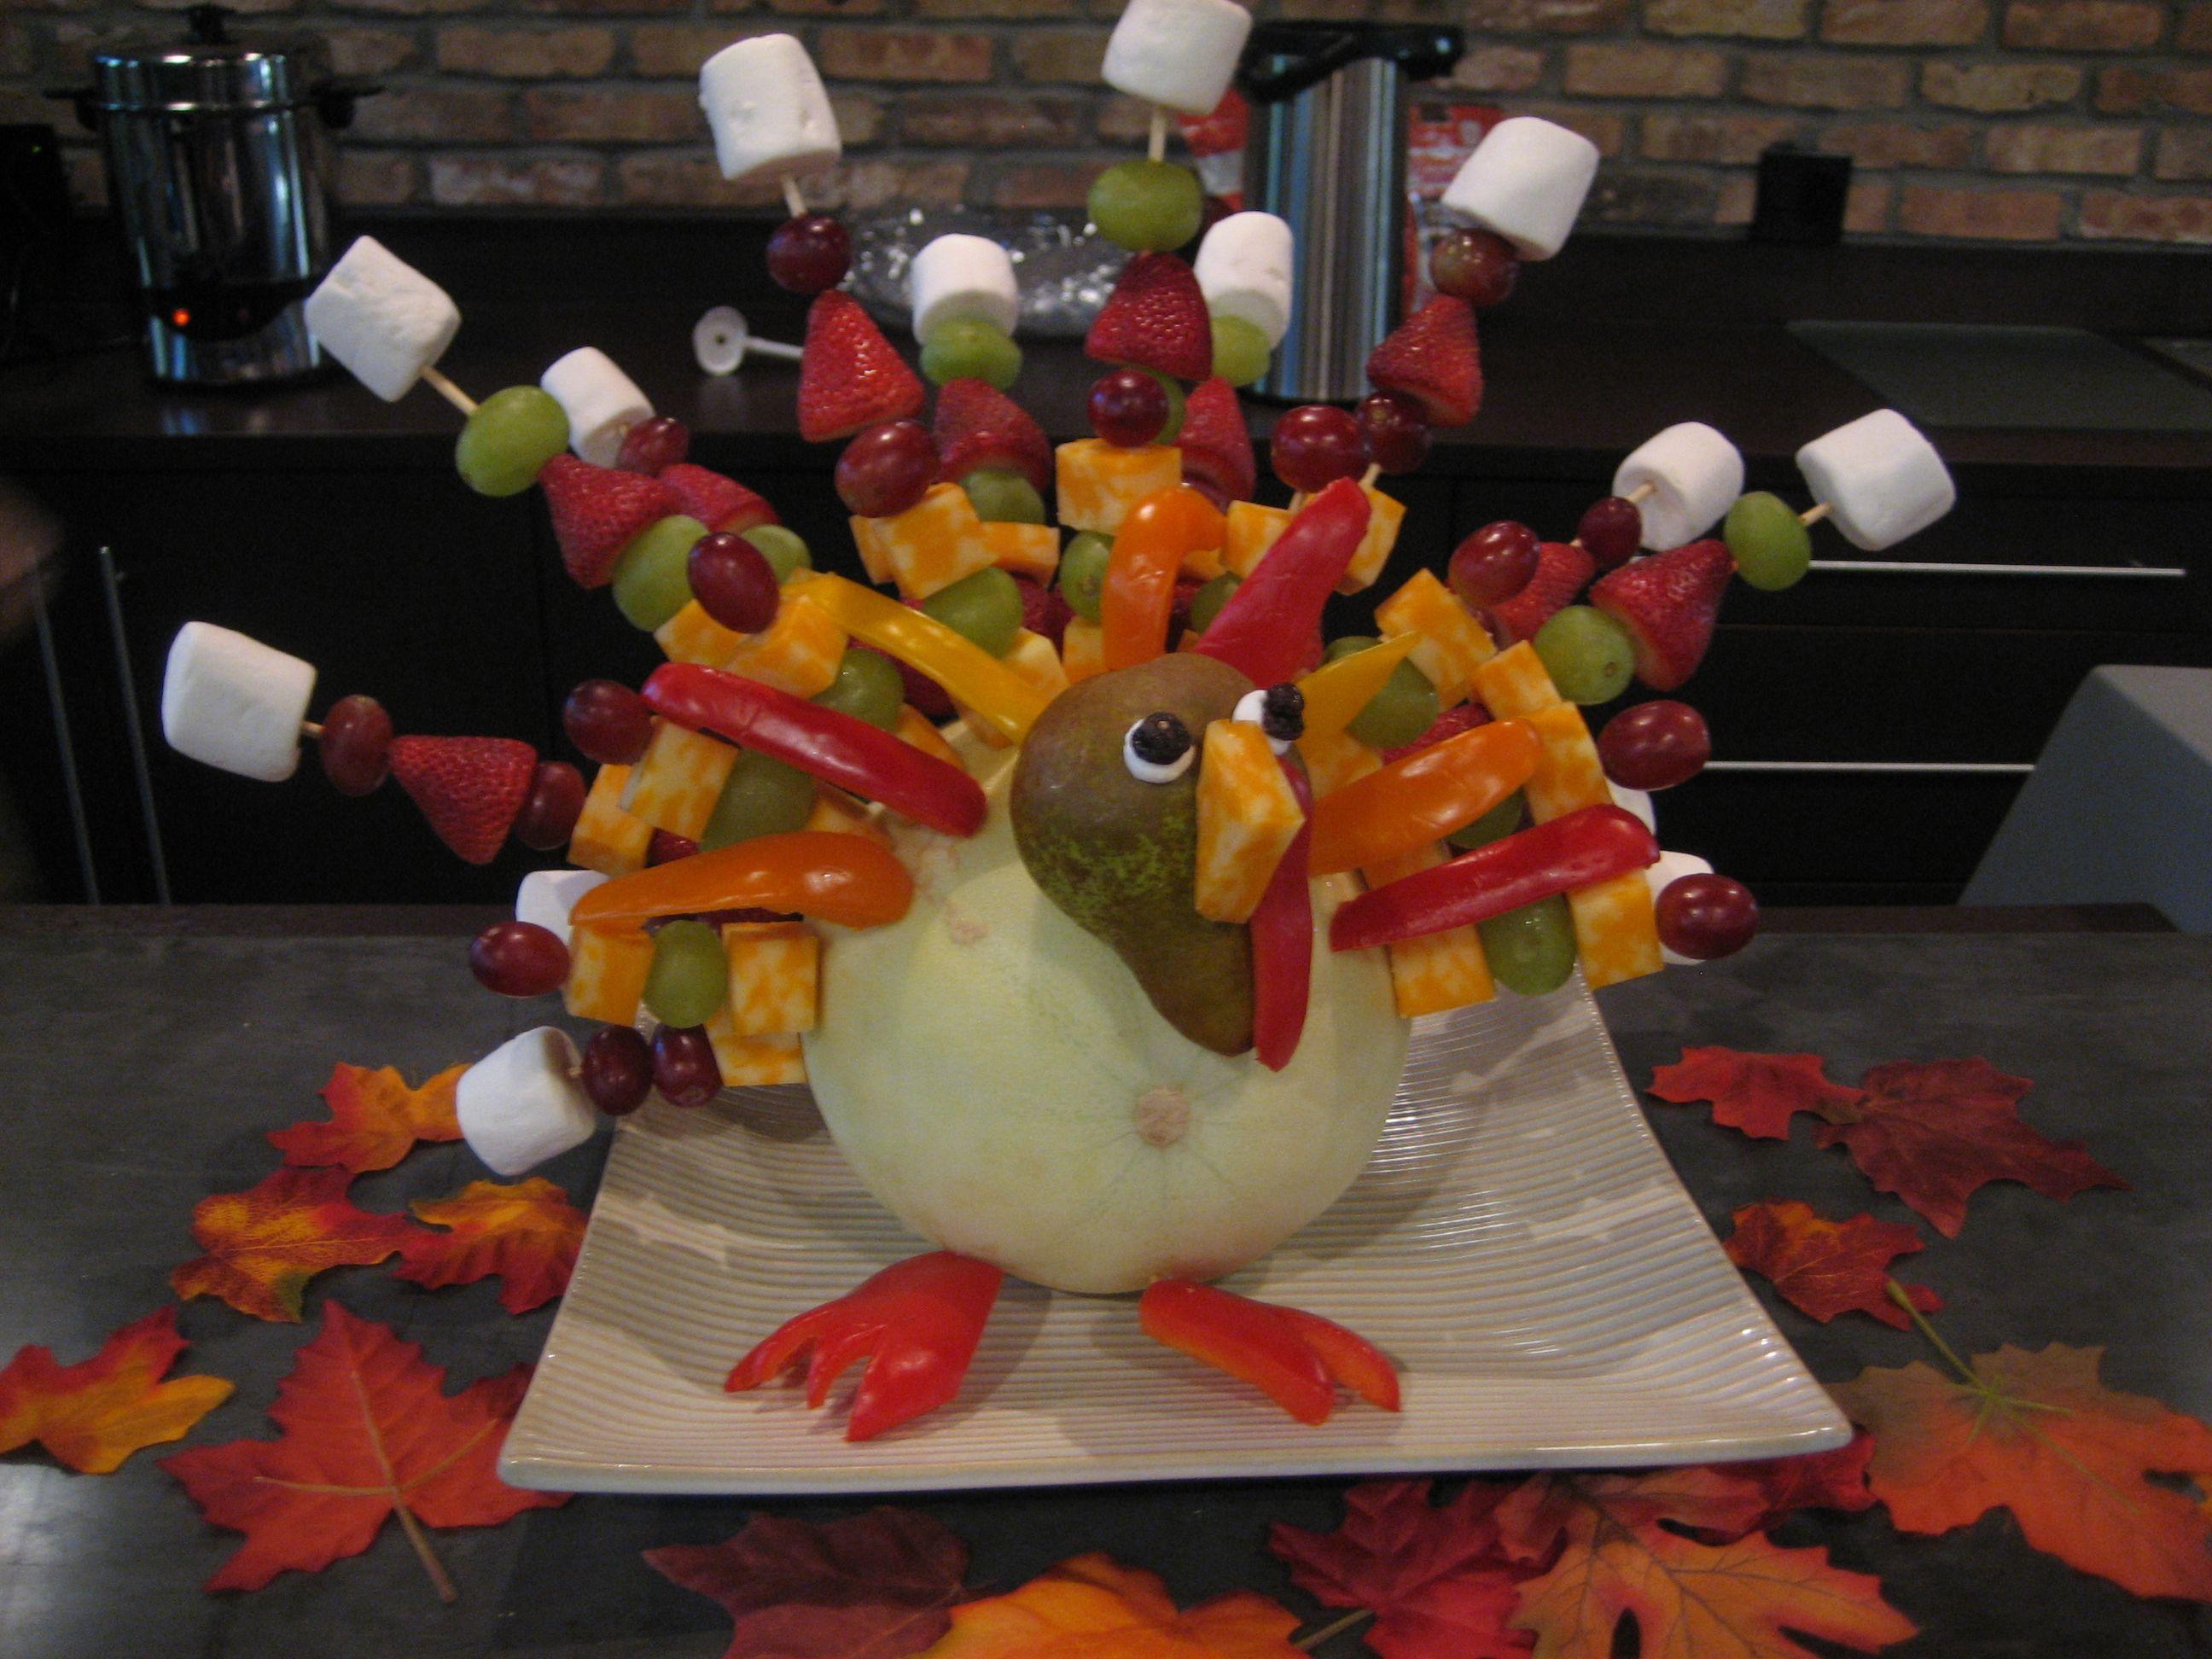 The Fruit Kabob Turkey